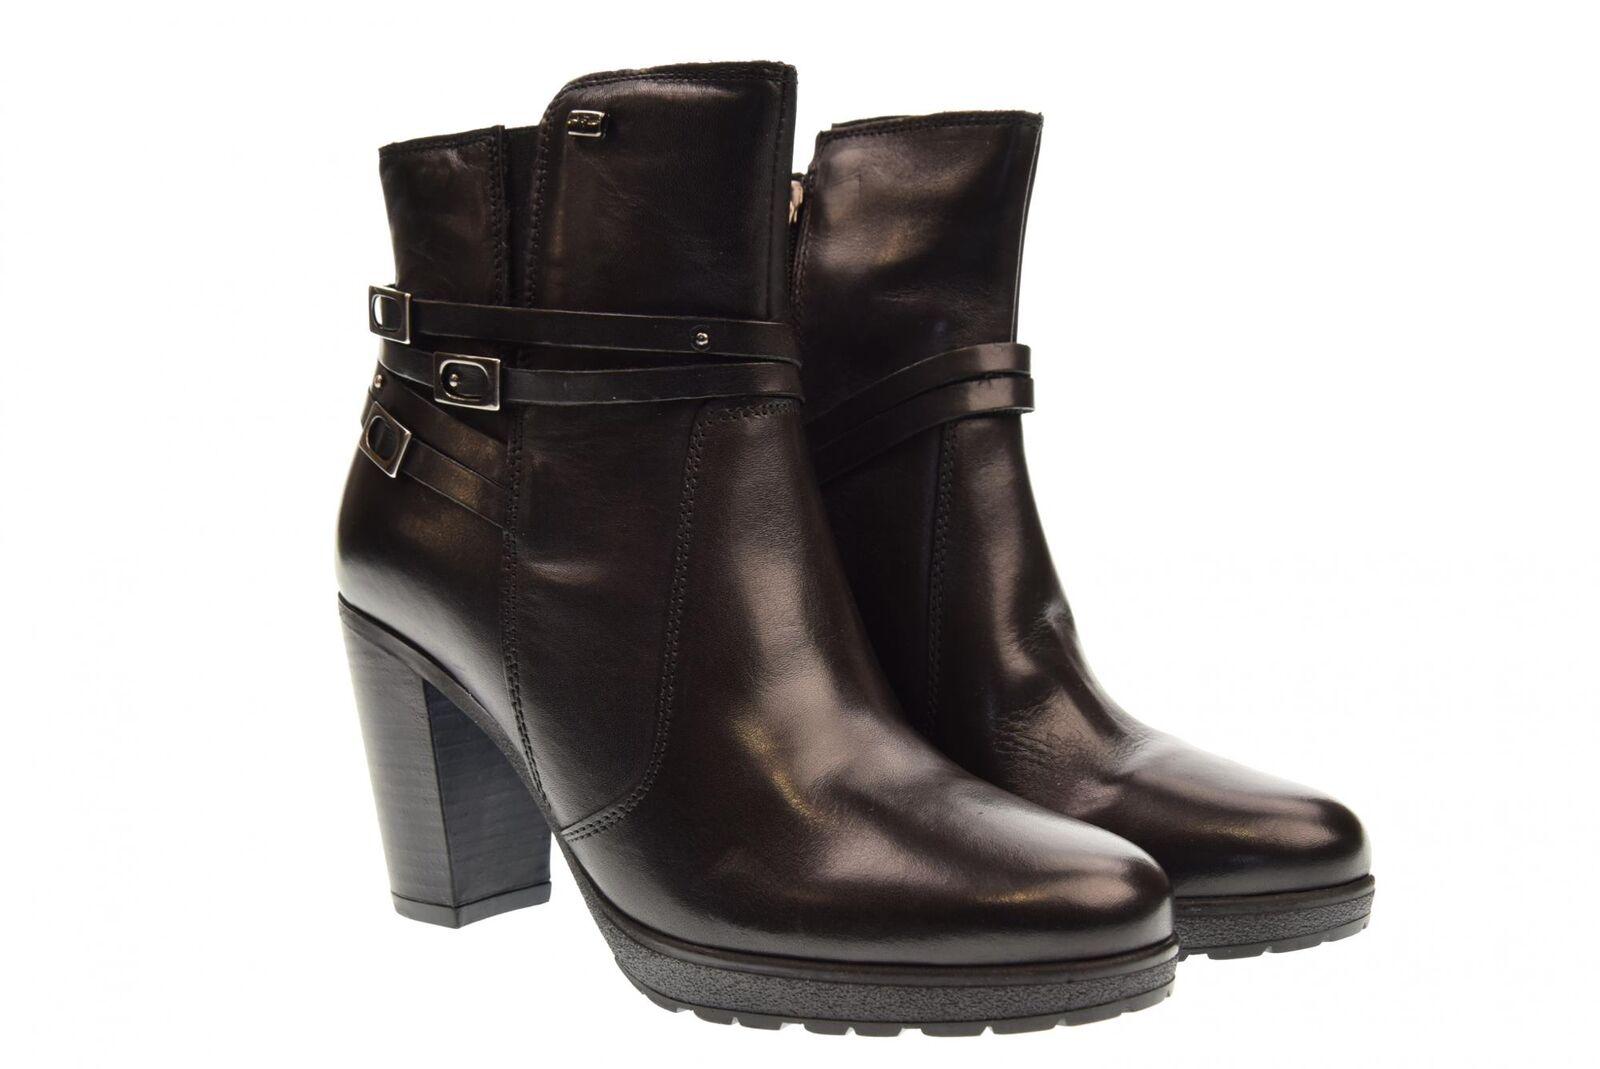 Vallegreen A18f shoes femme bottines 49501 BLACK